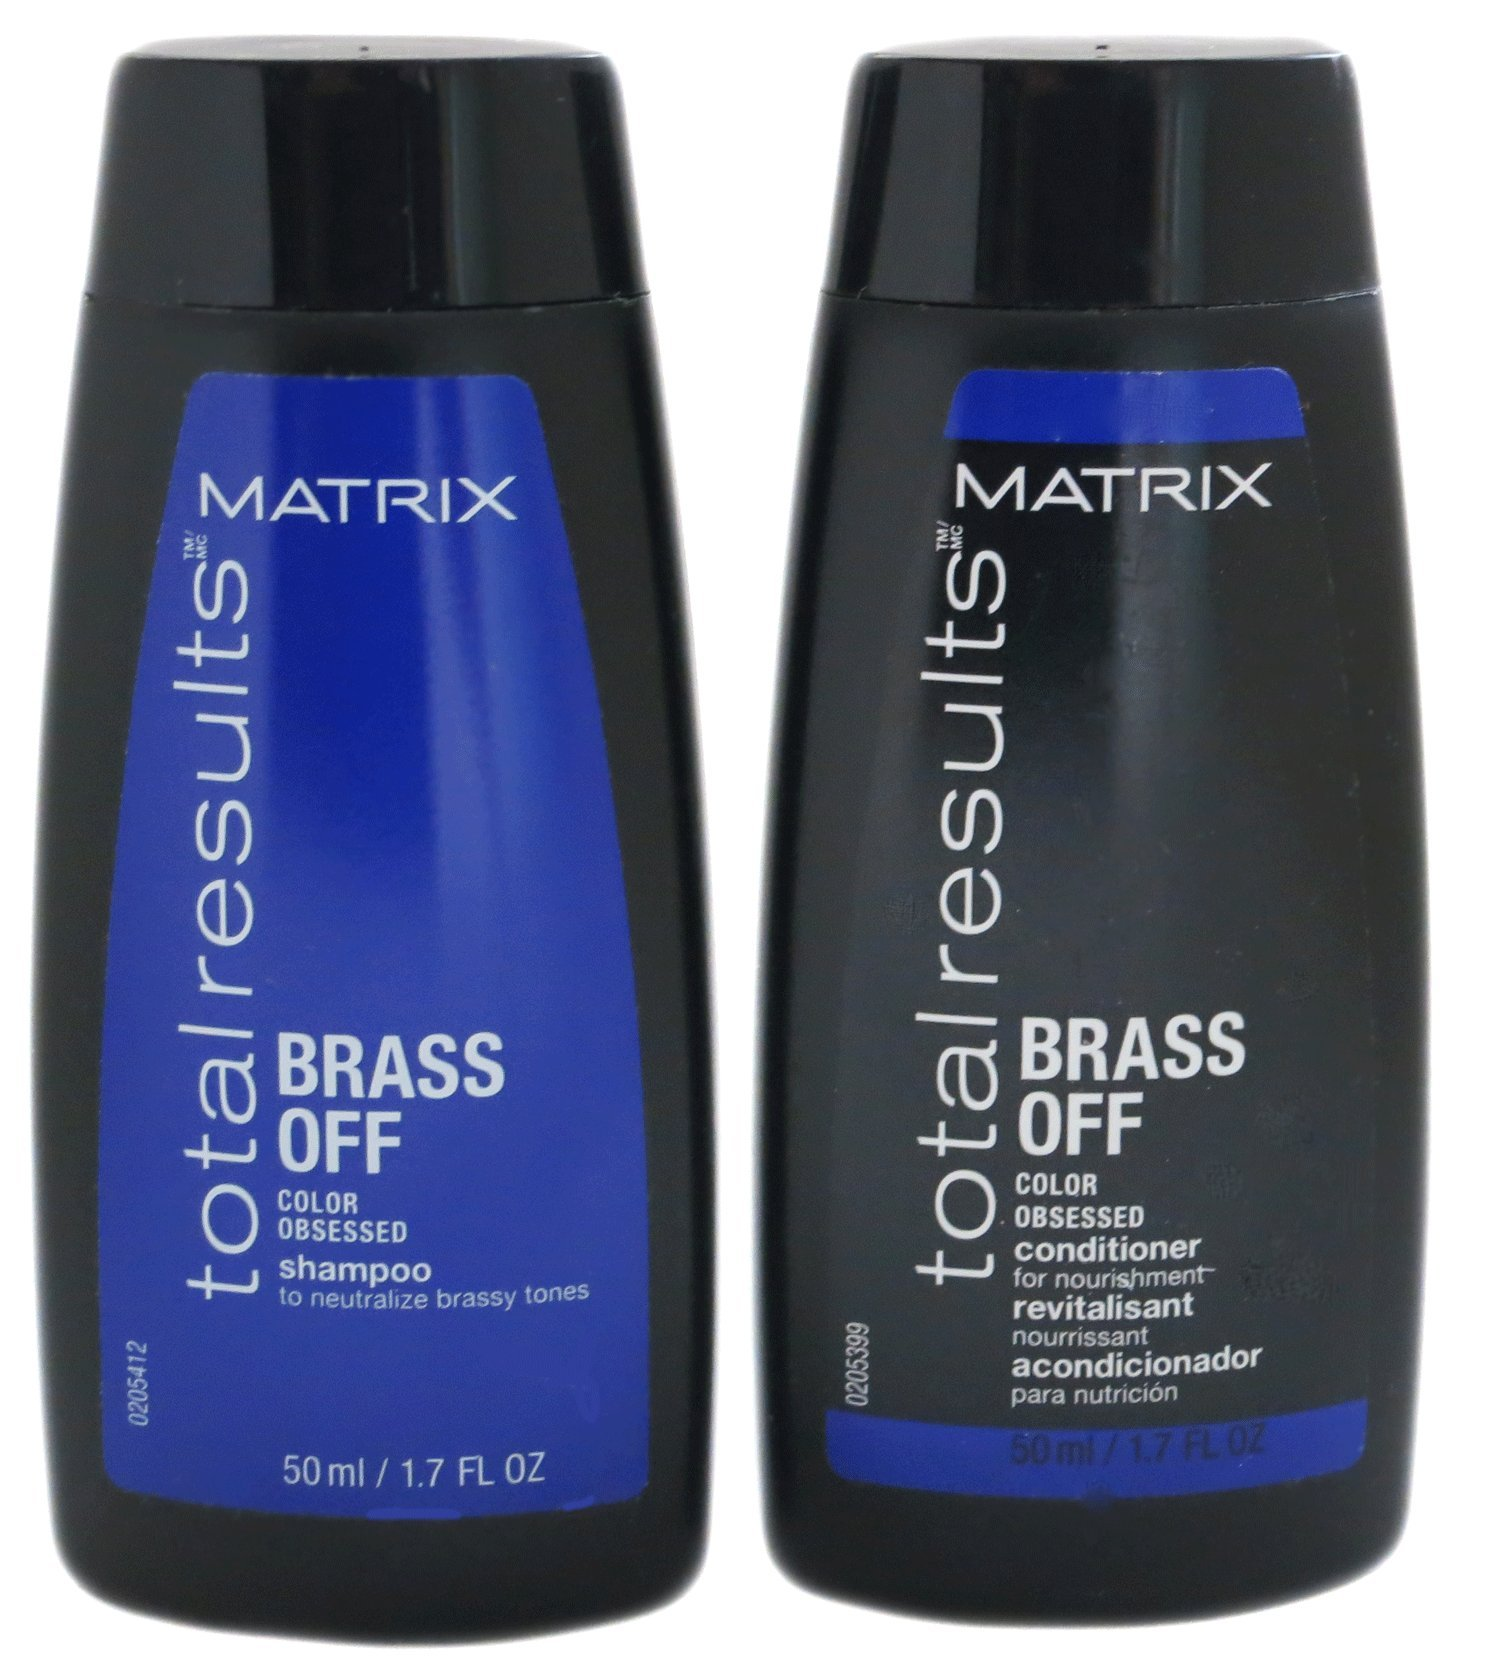 matrix brass off conditioner reviews